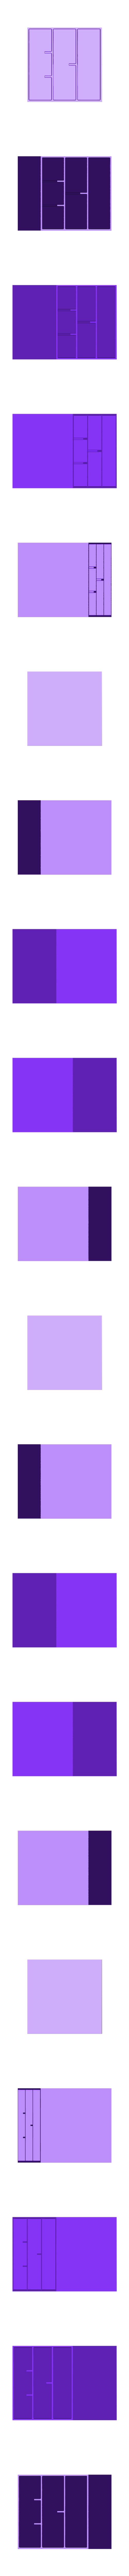 storage_cube_1.stl Download free STL file Storage Cubes • 3D print object, Morcelkin